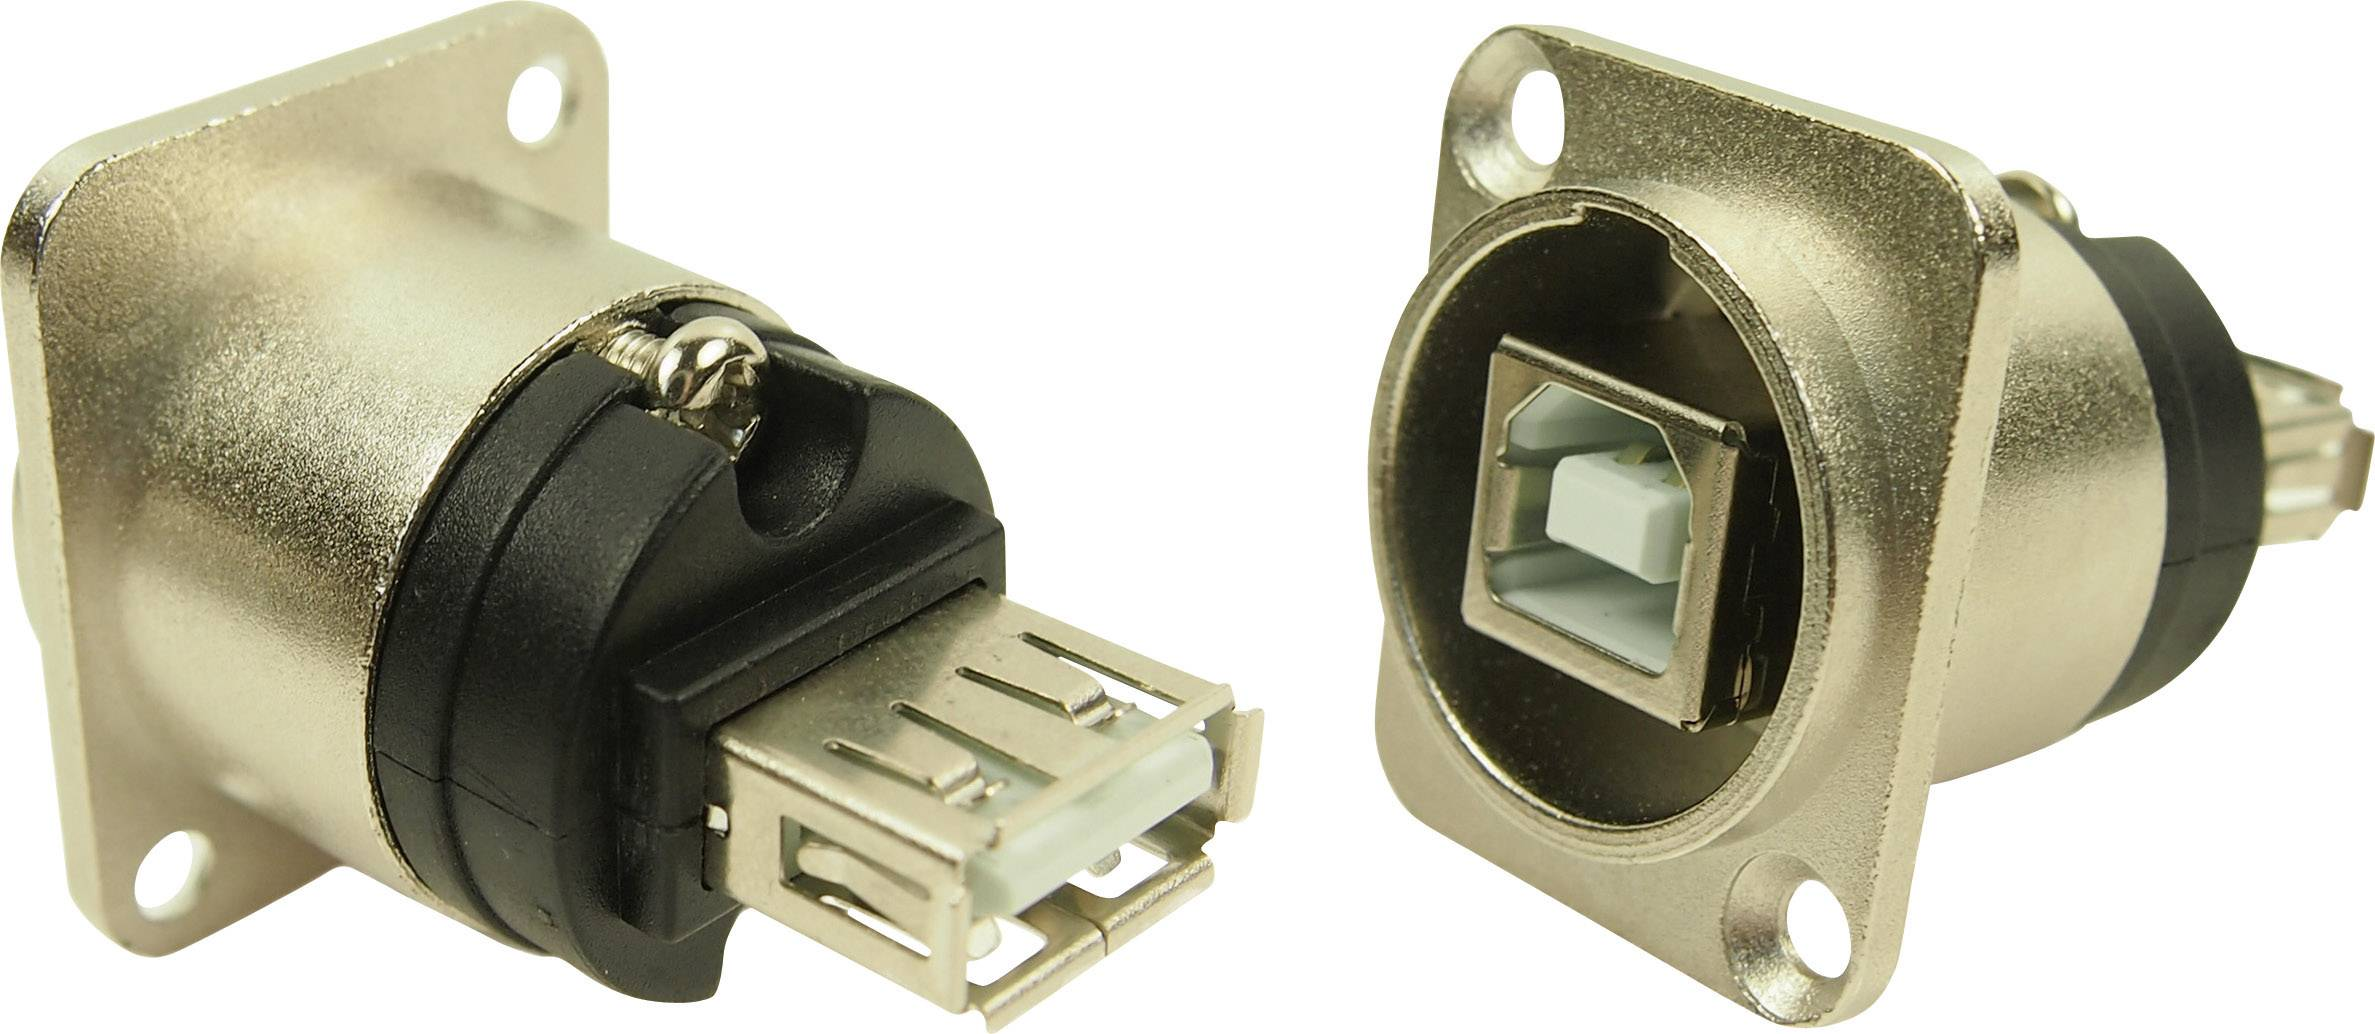 USB 2.0 adaptér, vstavateľný Cliff N/A CP30111, strieborná, 1 ks